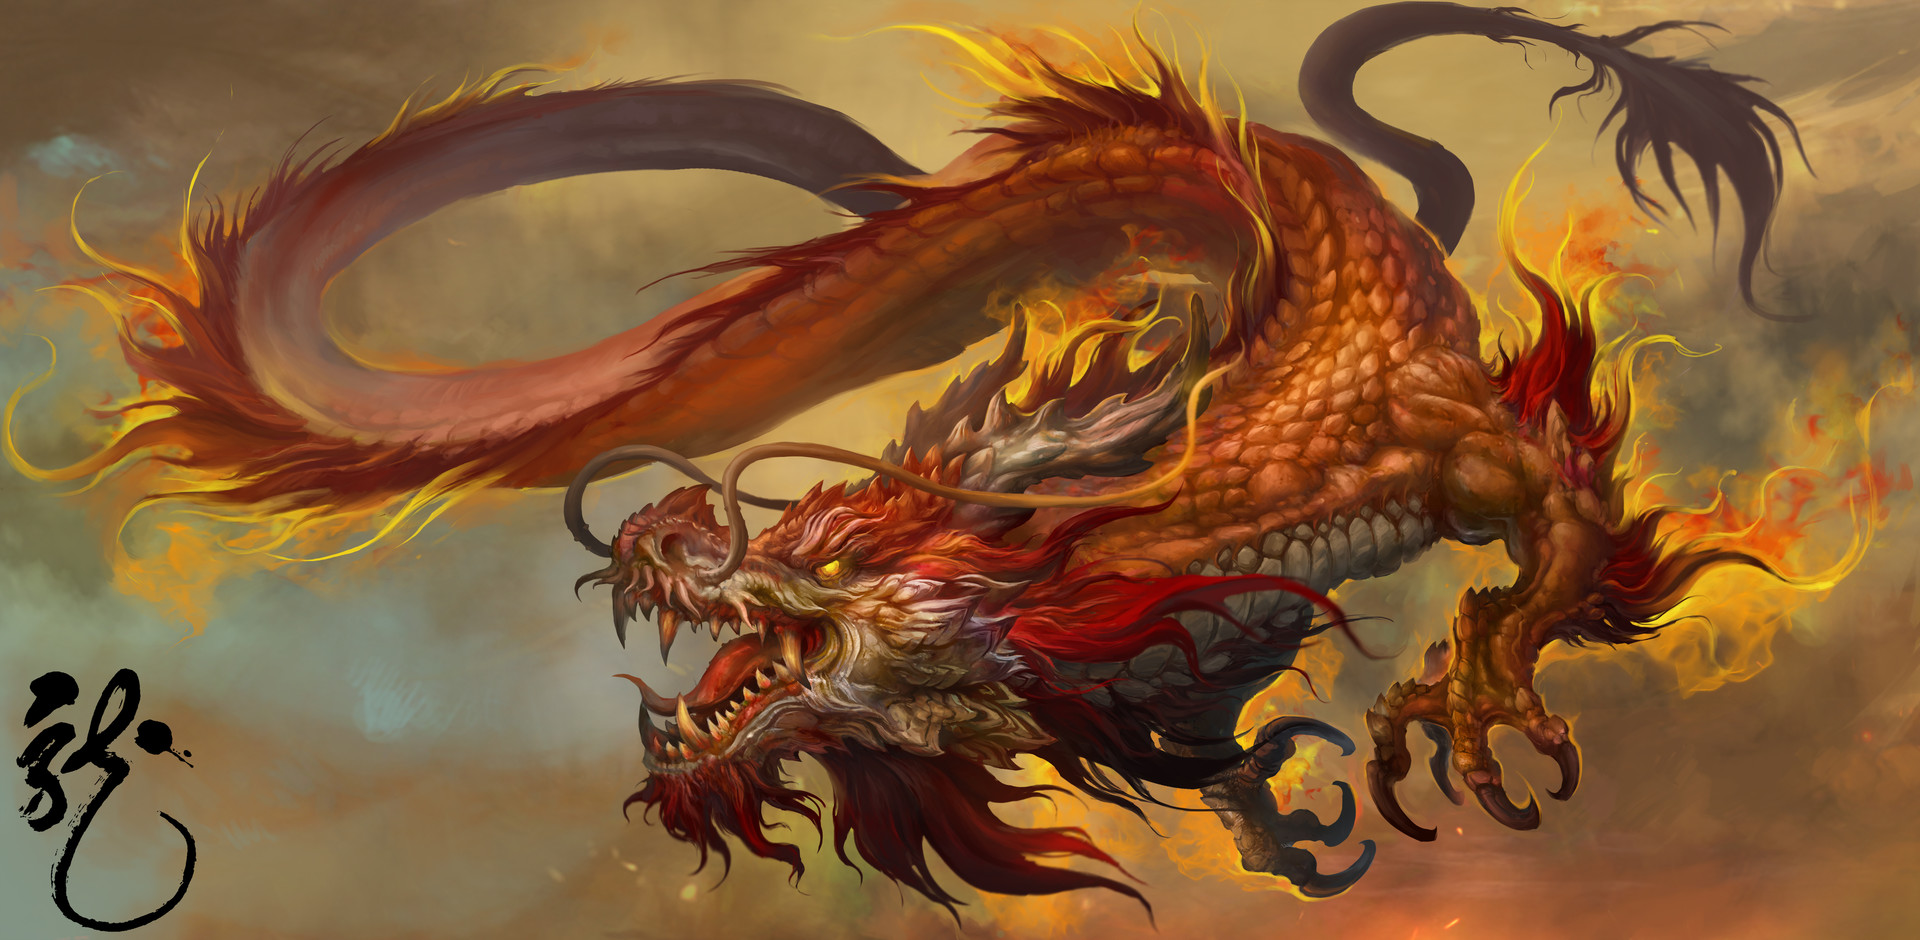 Artstation - Chinese Dragon Russell Dongjun Lu